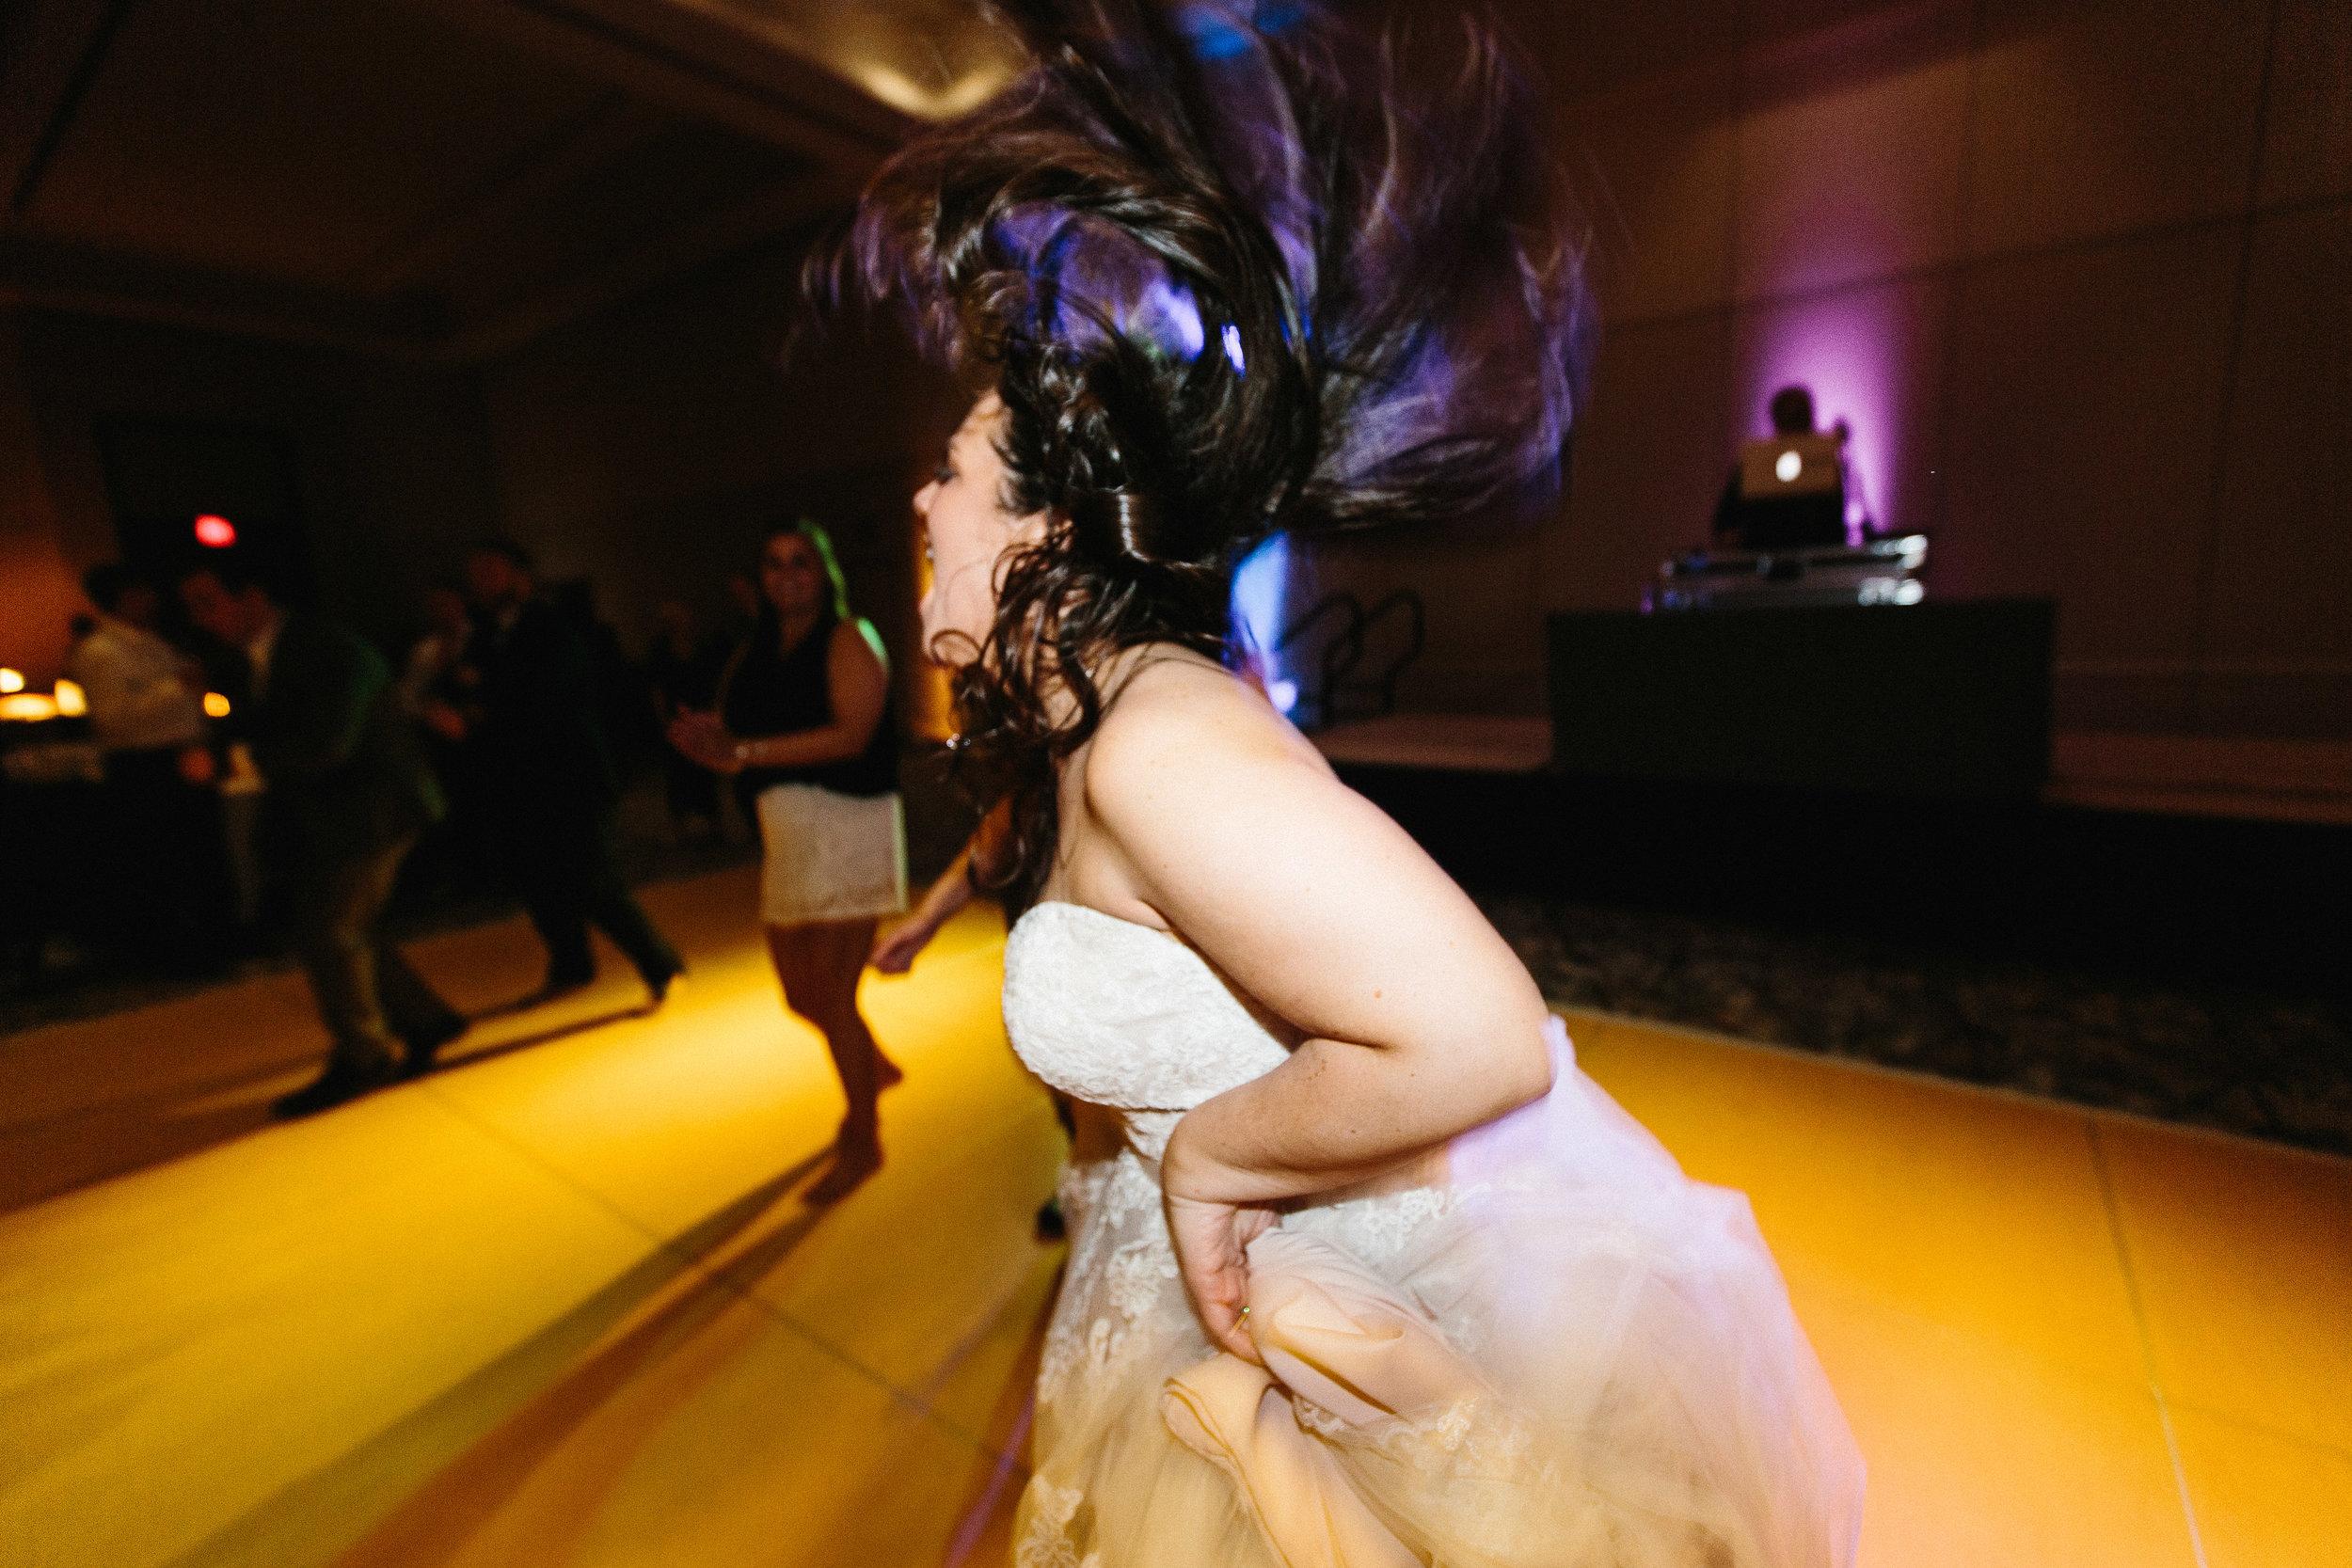 roswell_st_peter_chanel_catholic_avalon_hotel_alpharetta_wedding-2213.jpg